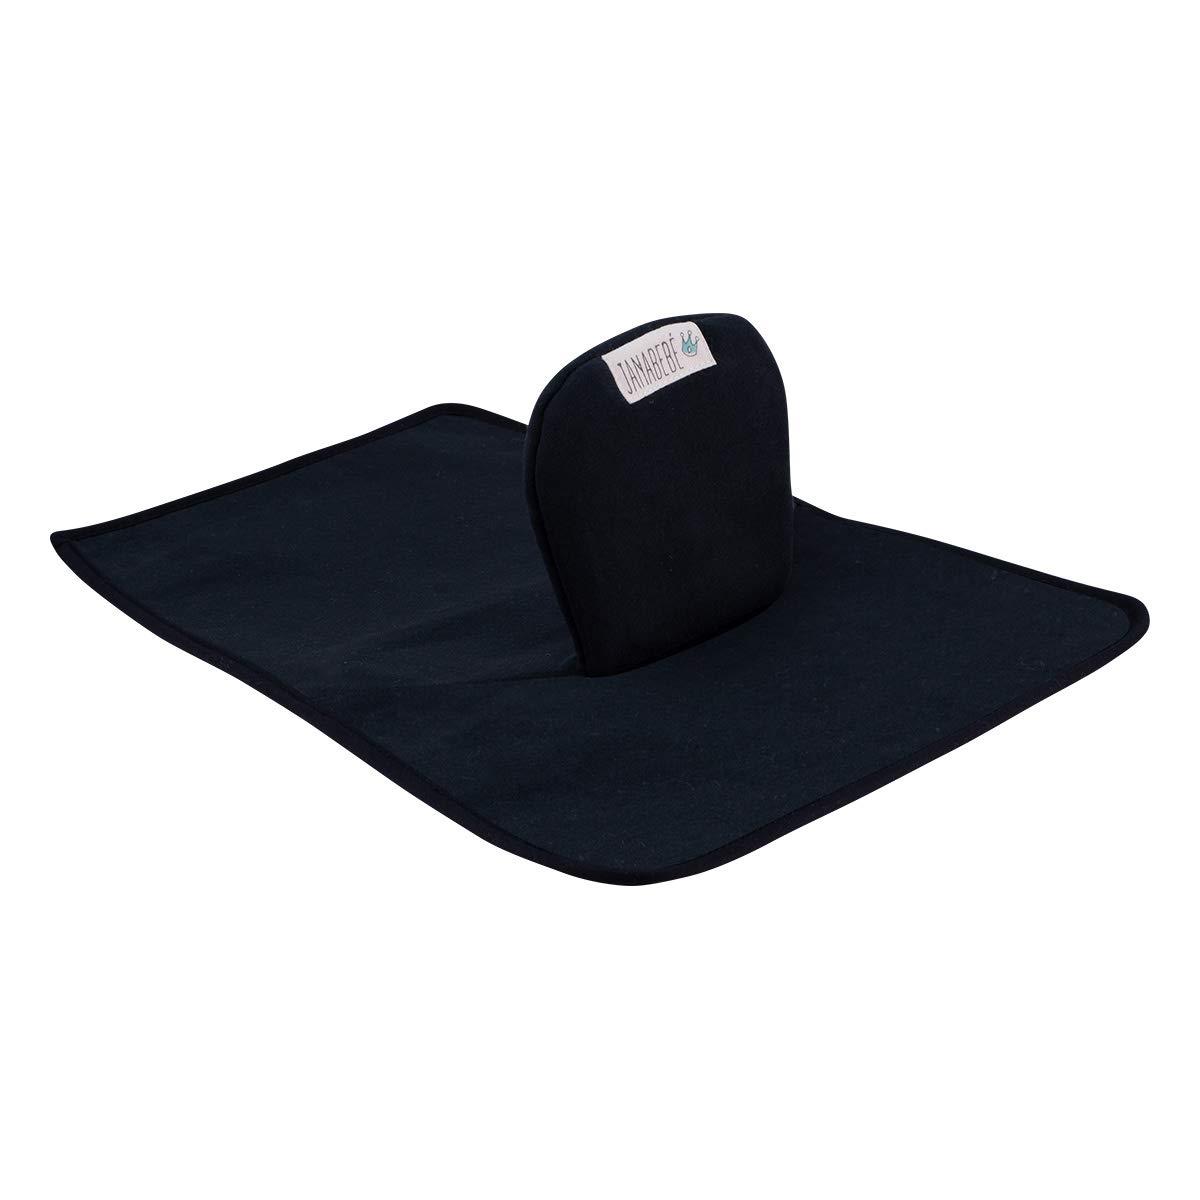 JANABEBE Trainer Cushion Super Absorbent Reusable (Black Series)